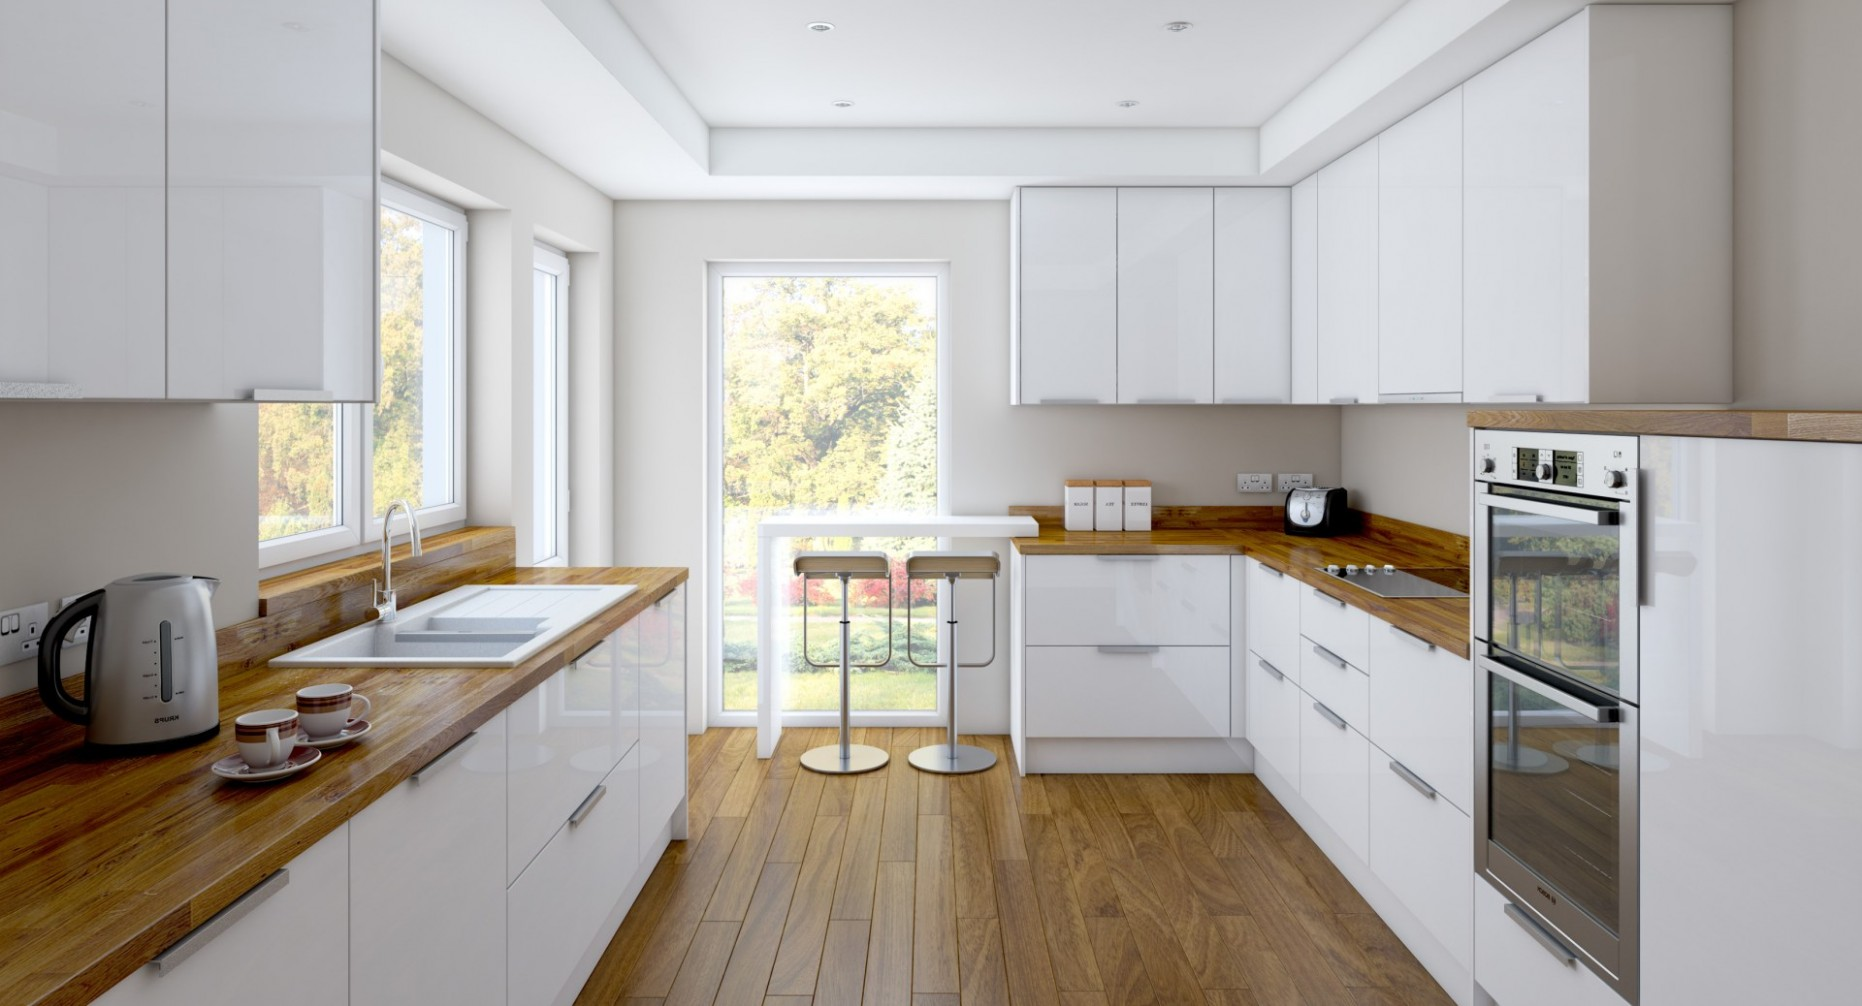 Kuchyně Beroun - Kuchyně Beroun